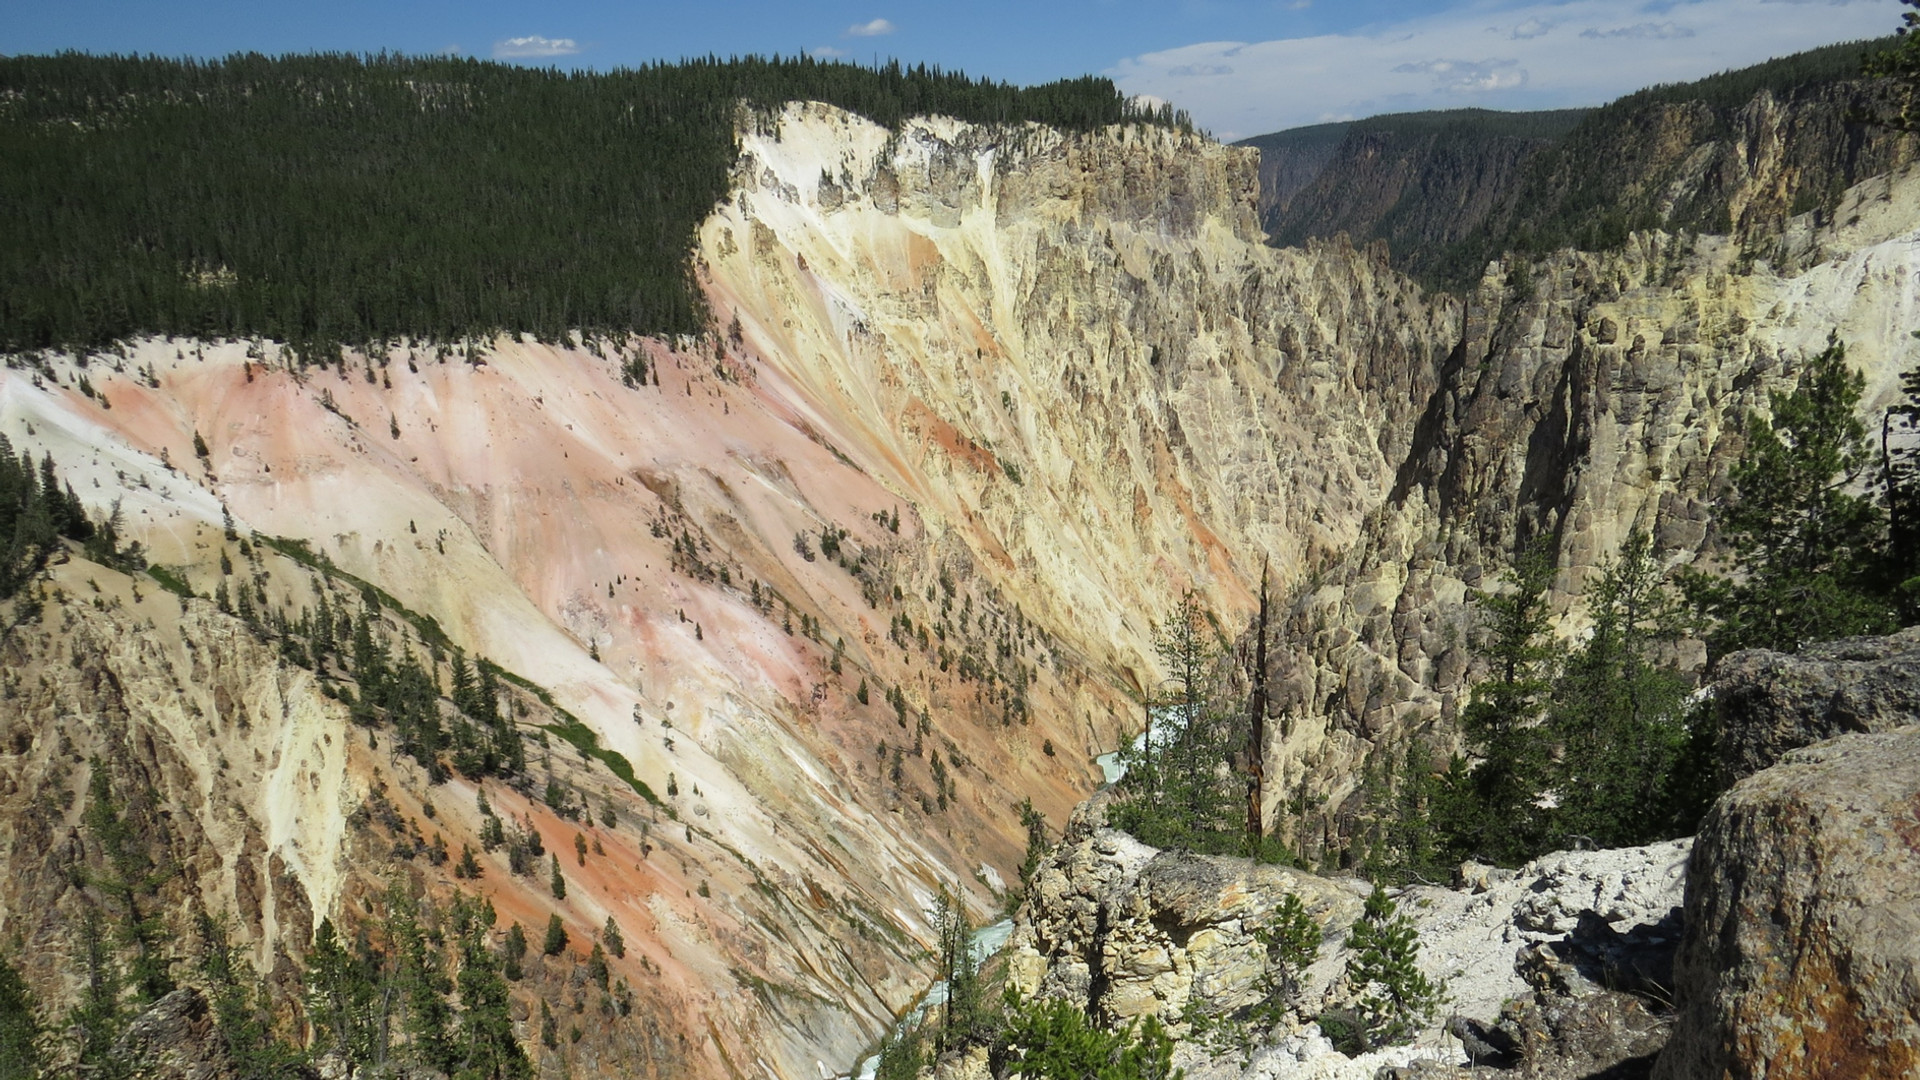 yellowstone-tour-grand-canyon